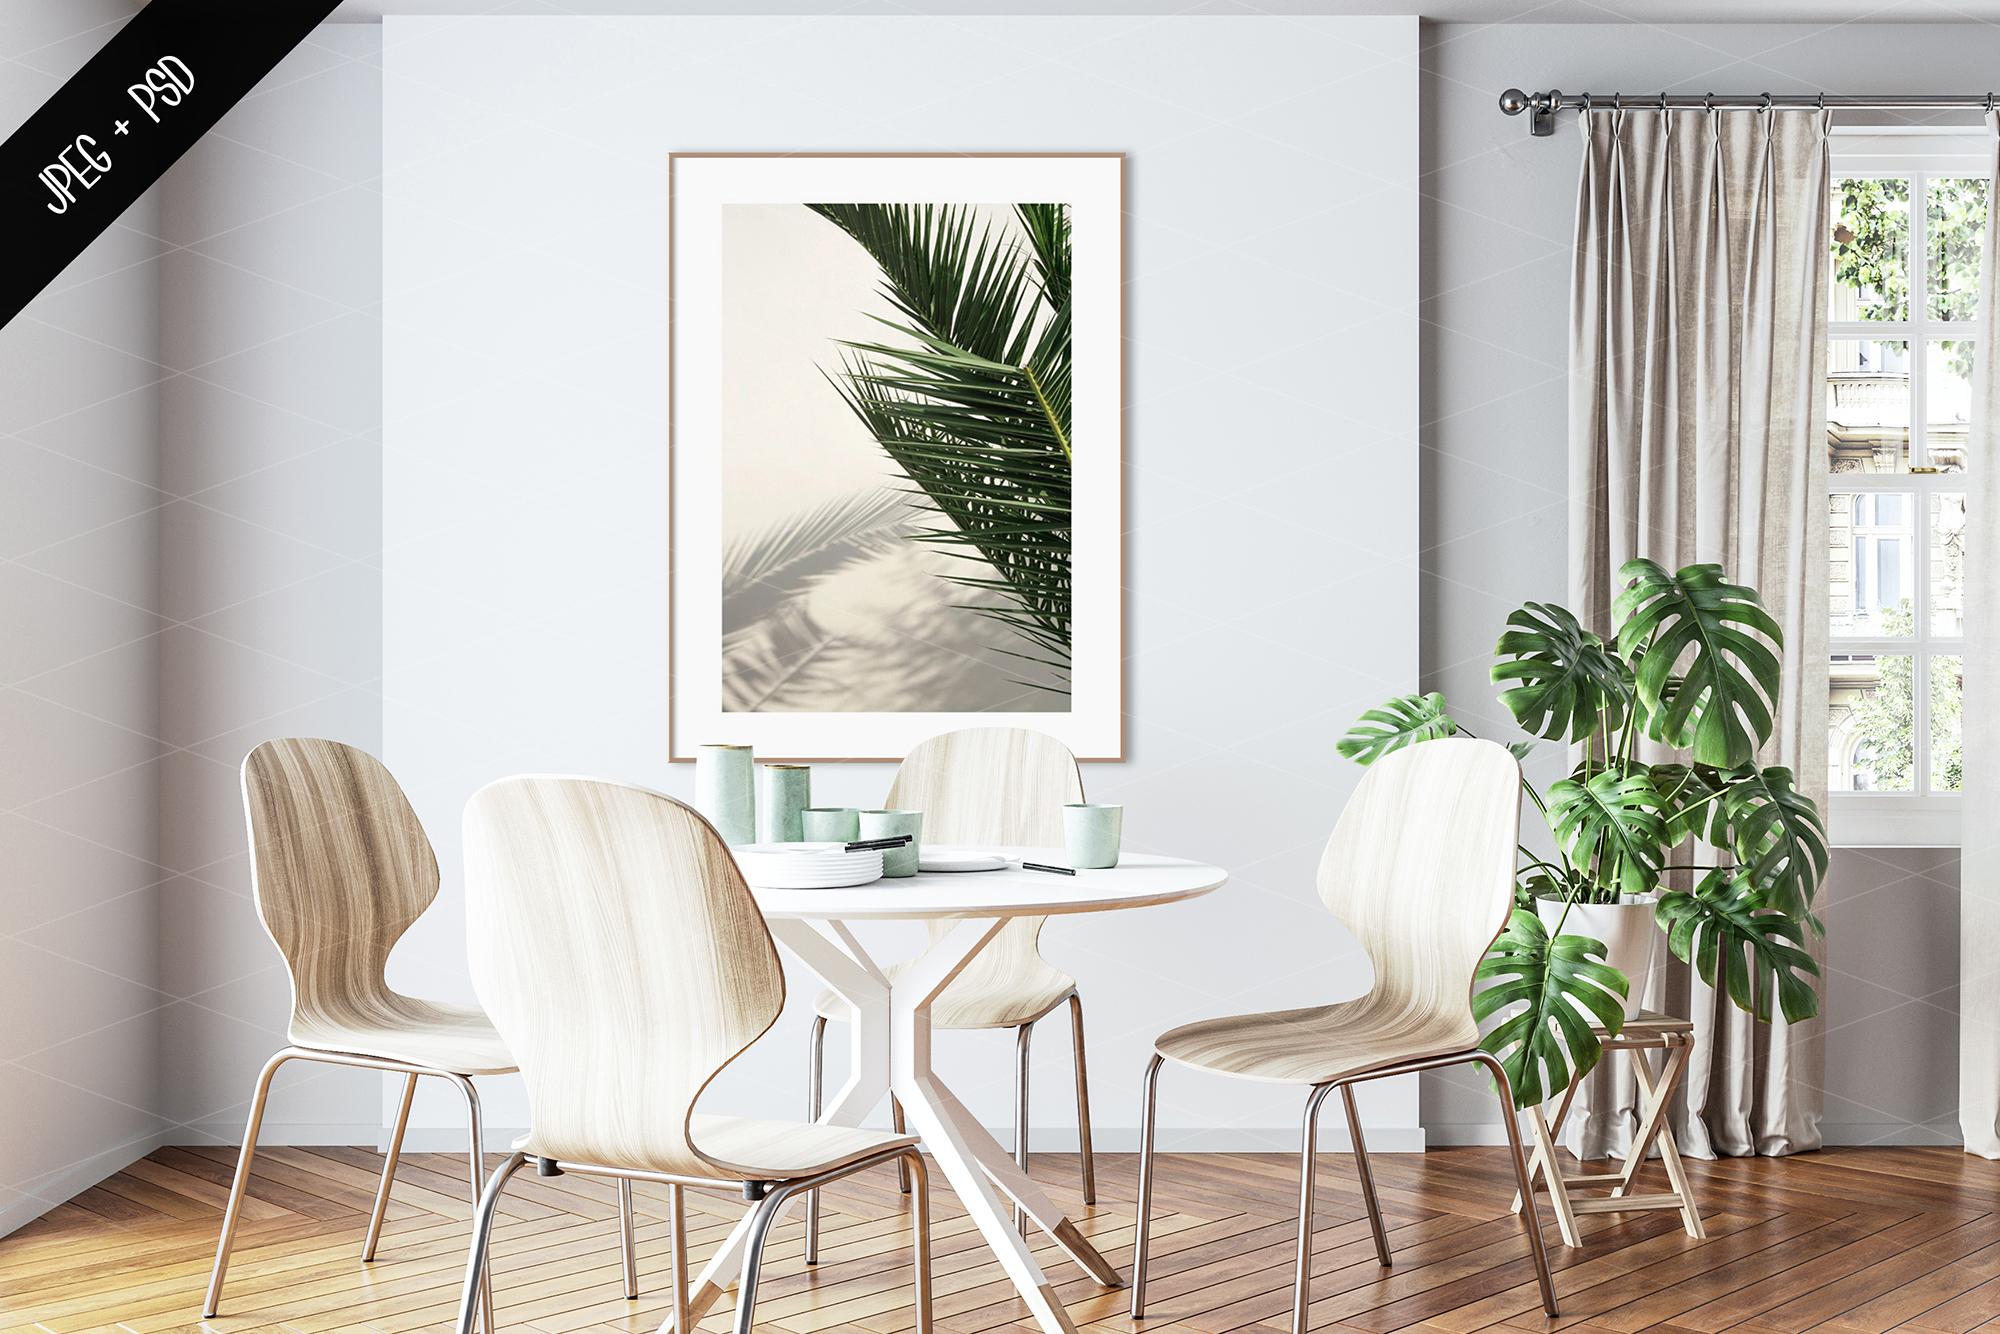 Interior mockup BUNDLE - frame & wall mockup creator example image 15